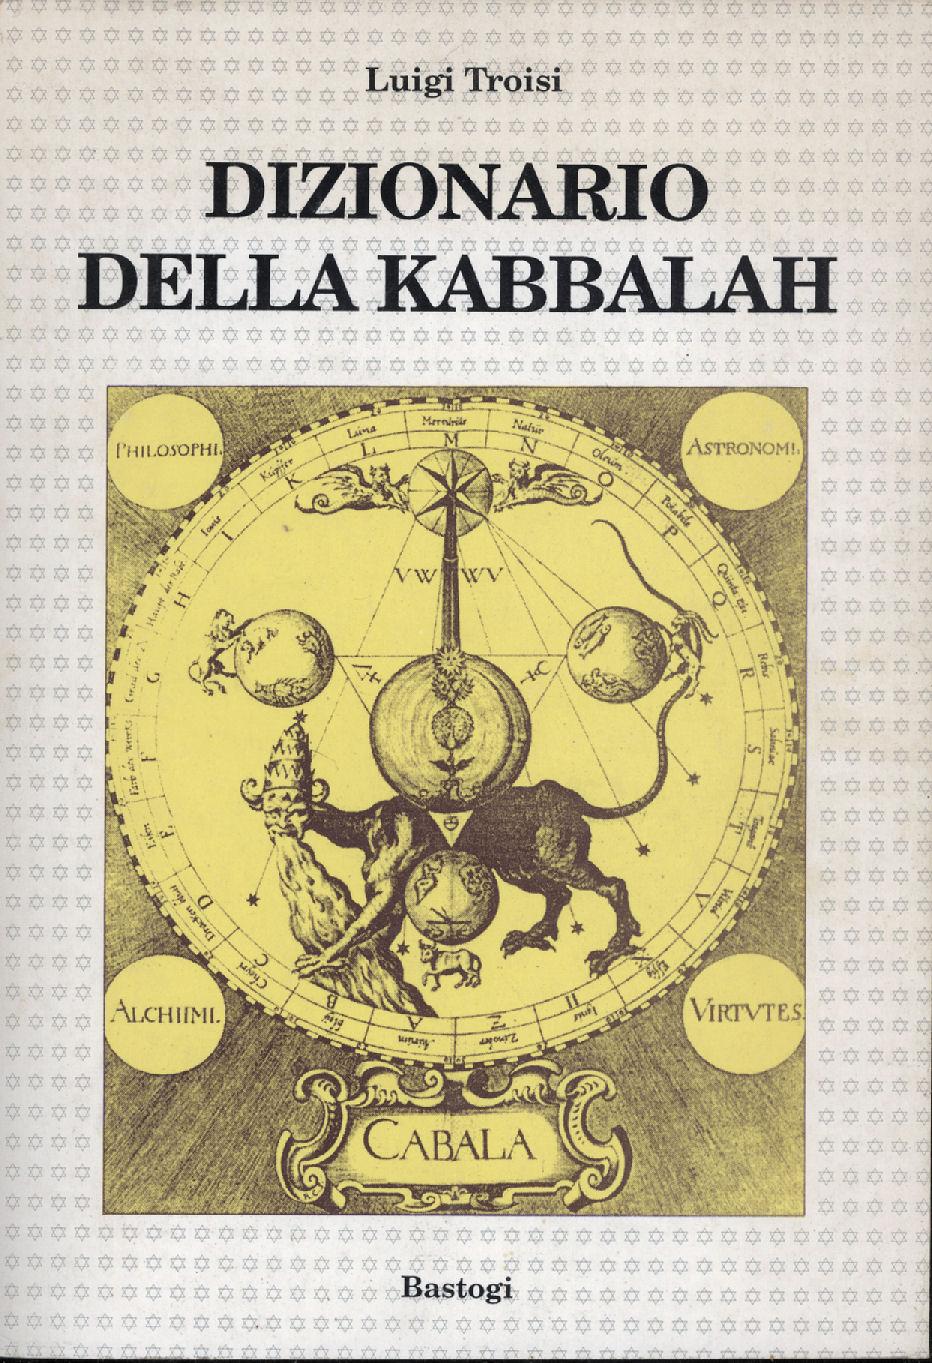 Dizionario della kabbalah